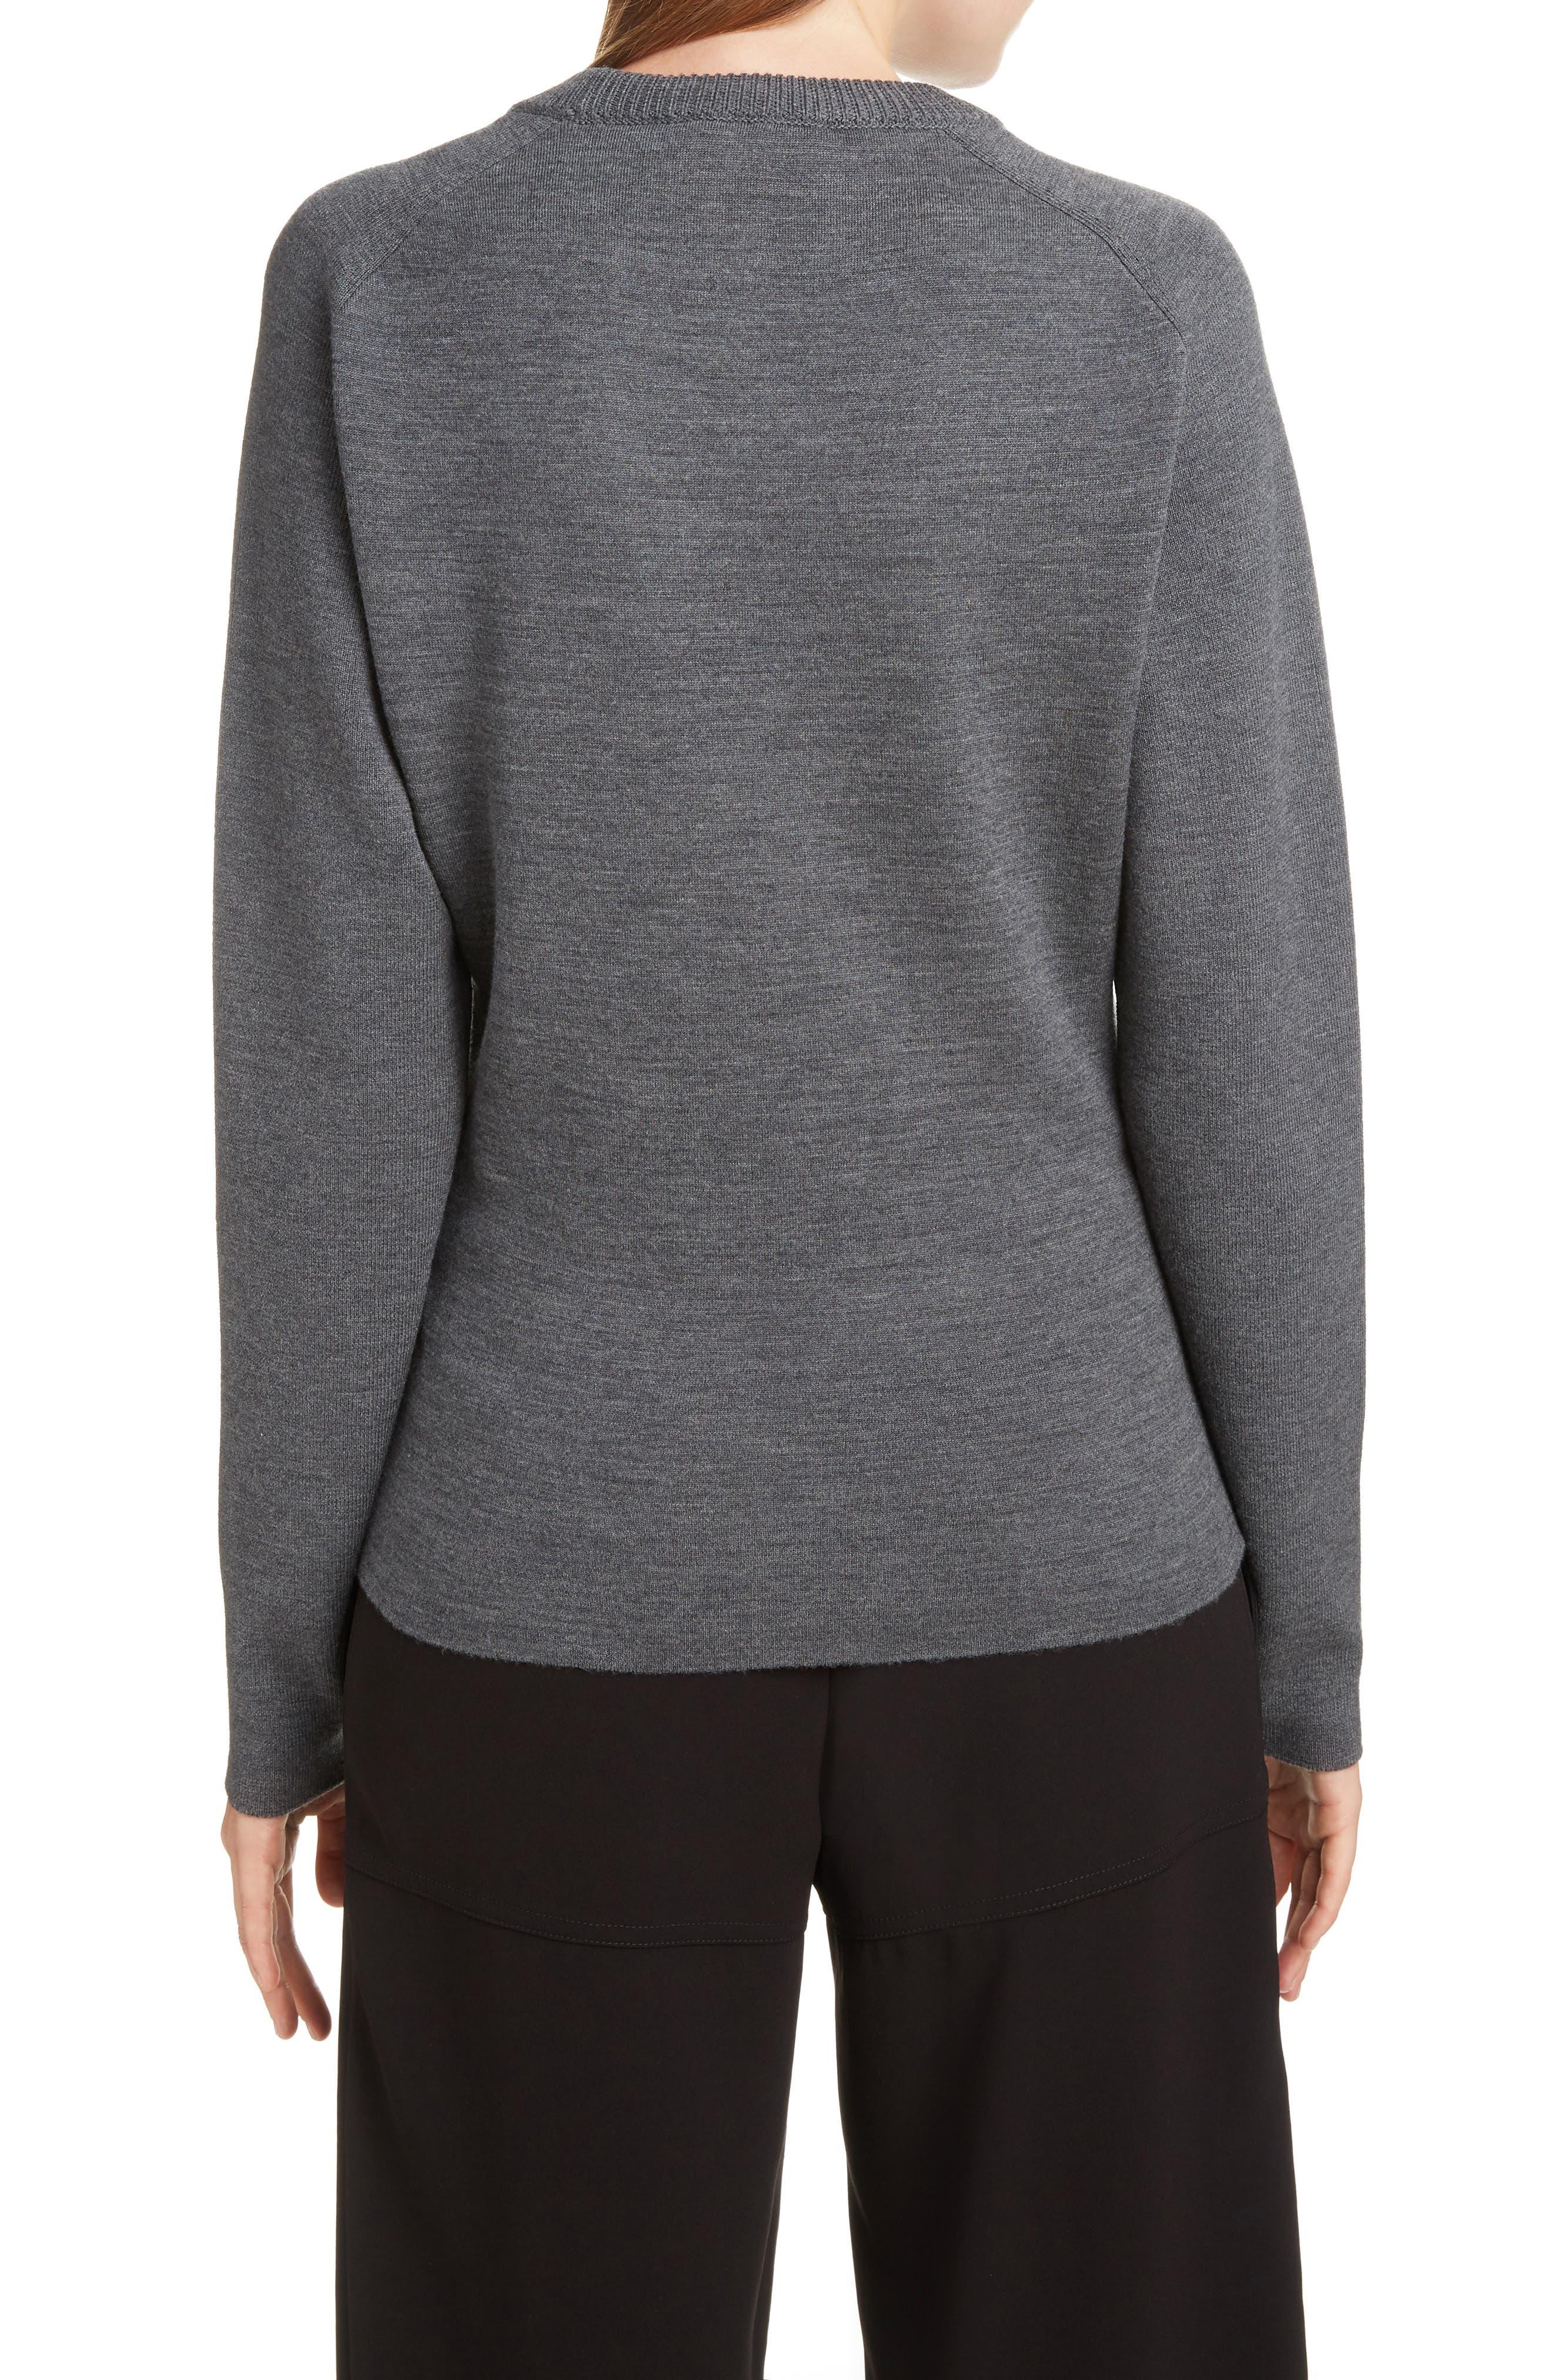 Brocade C Sweater,                             Alternate thumbnail 2, color,                             CONFIDENT GREY